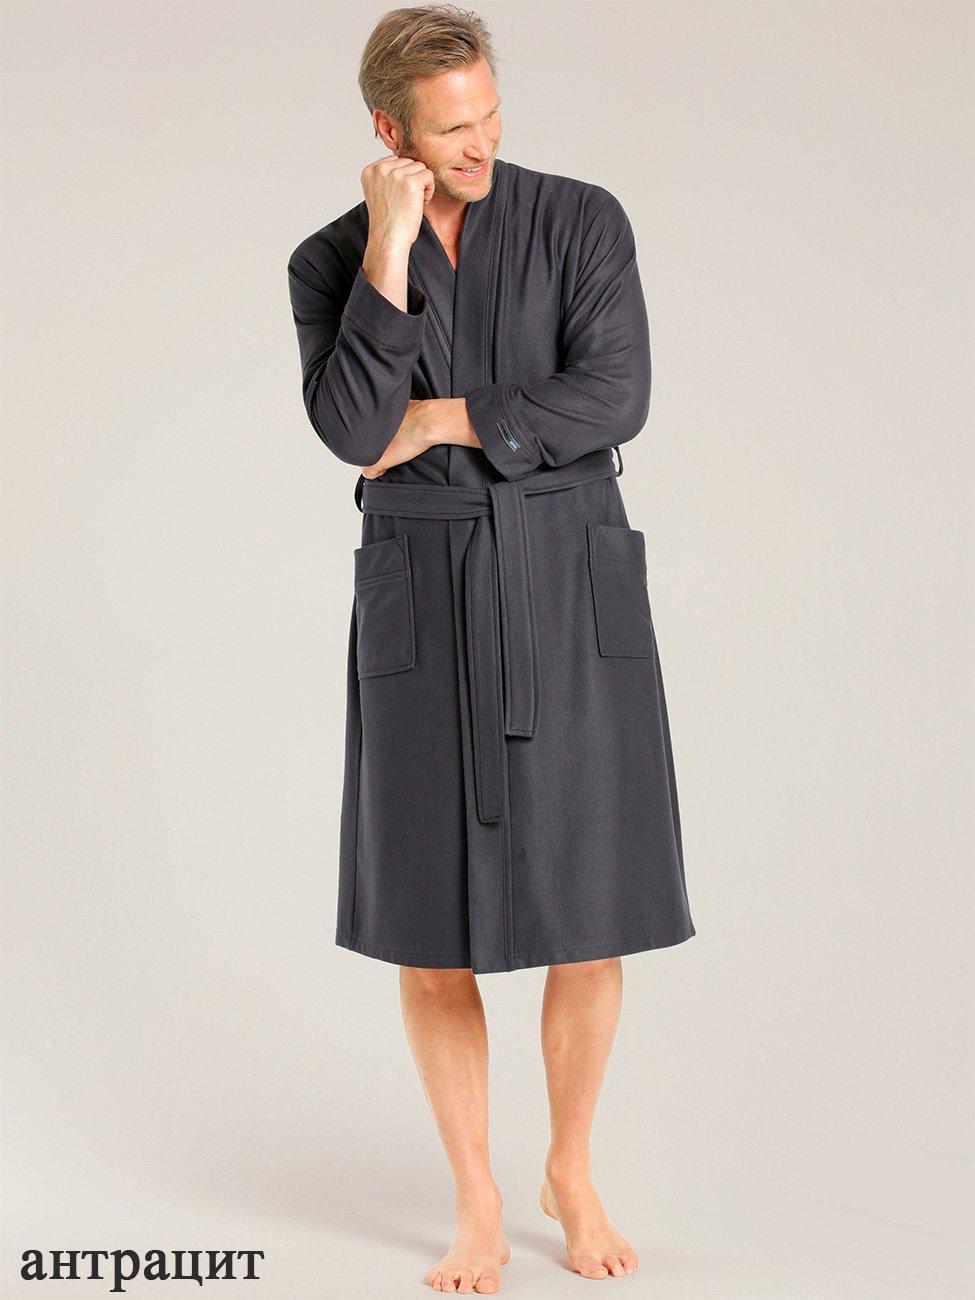 Мужской велюровый халат, антрацит 000650-313 Taubert